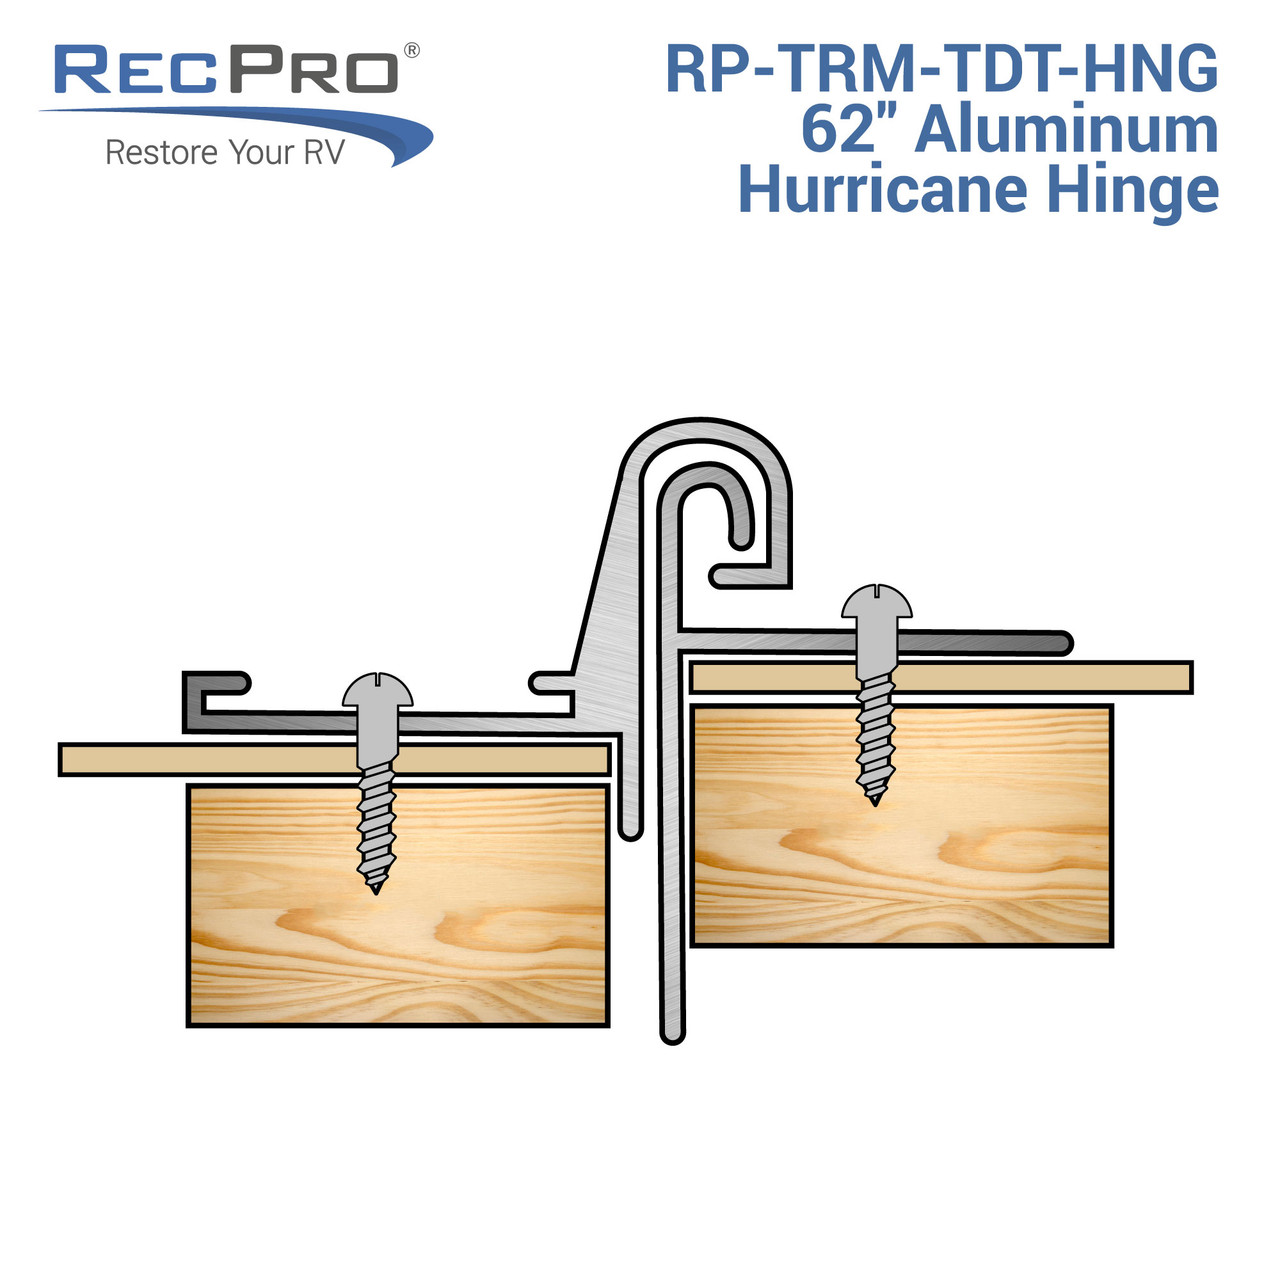 "RV Teardrop Tear Drop Trailer 72/"" Aluminum Hurricane Hinge"